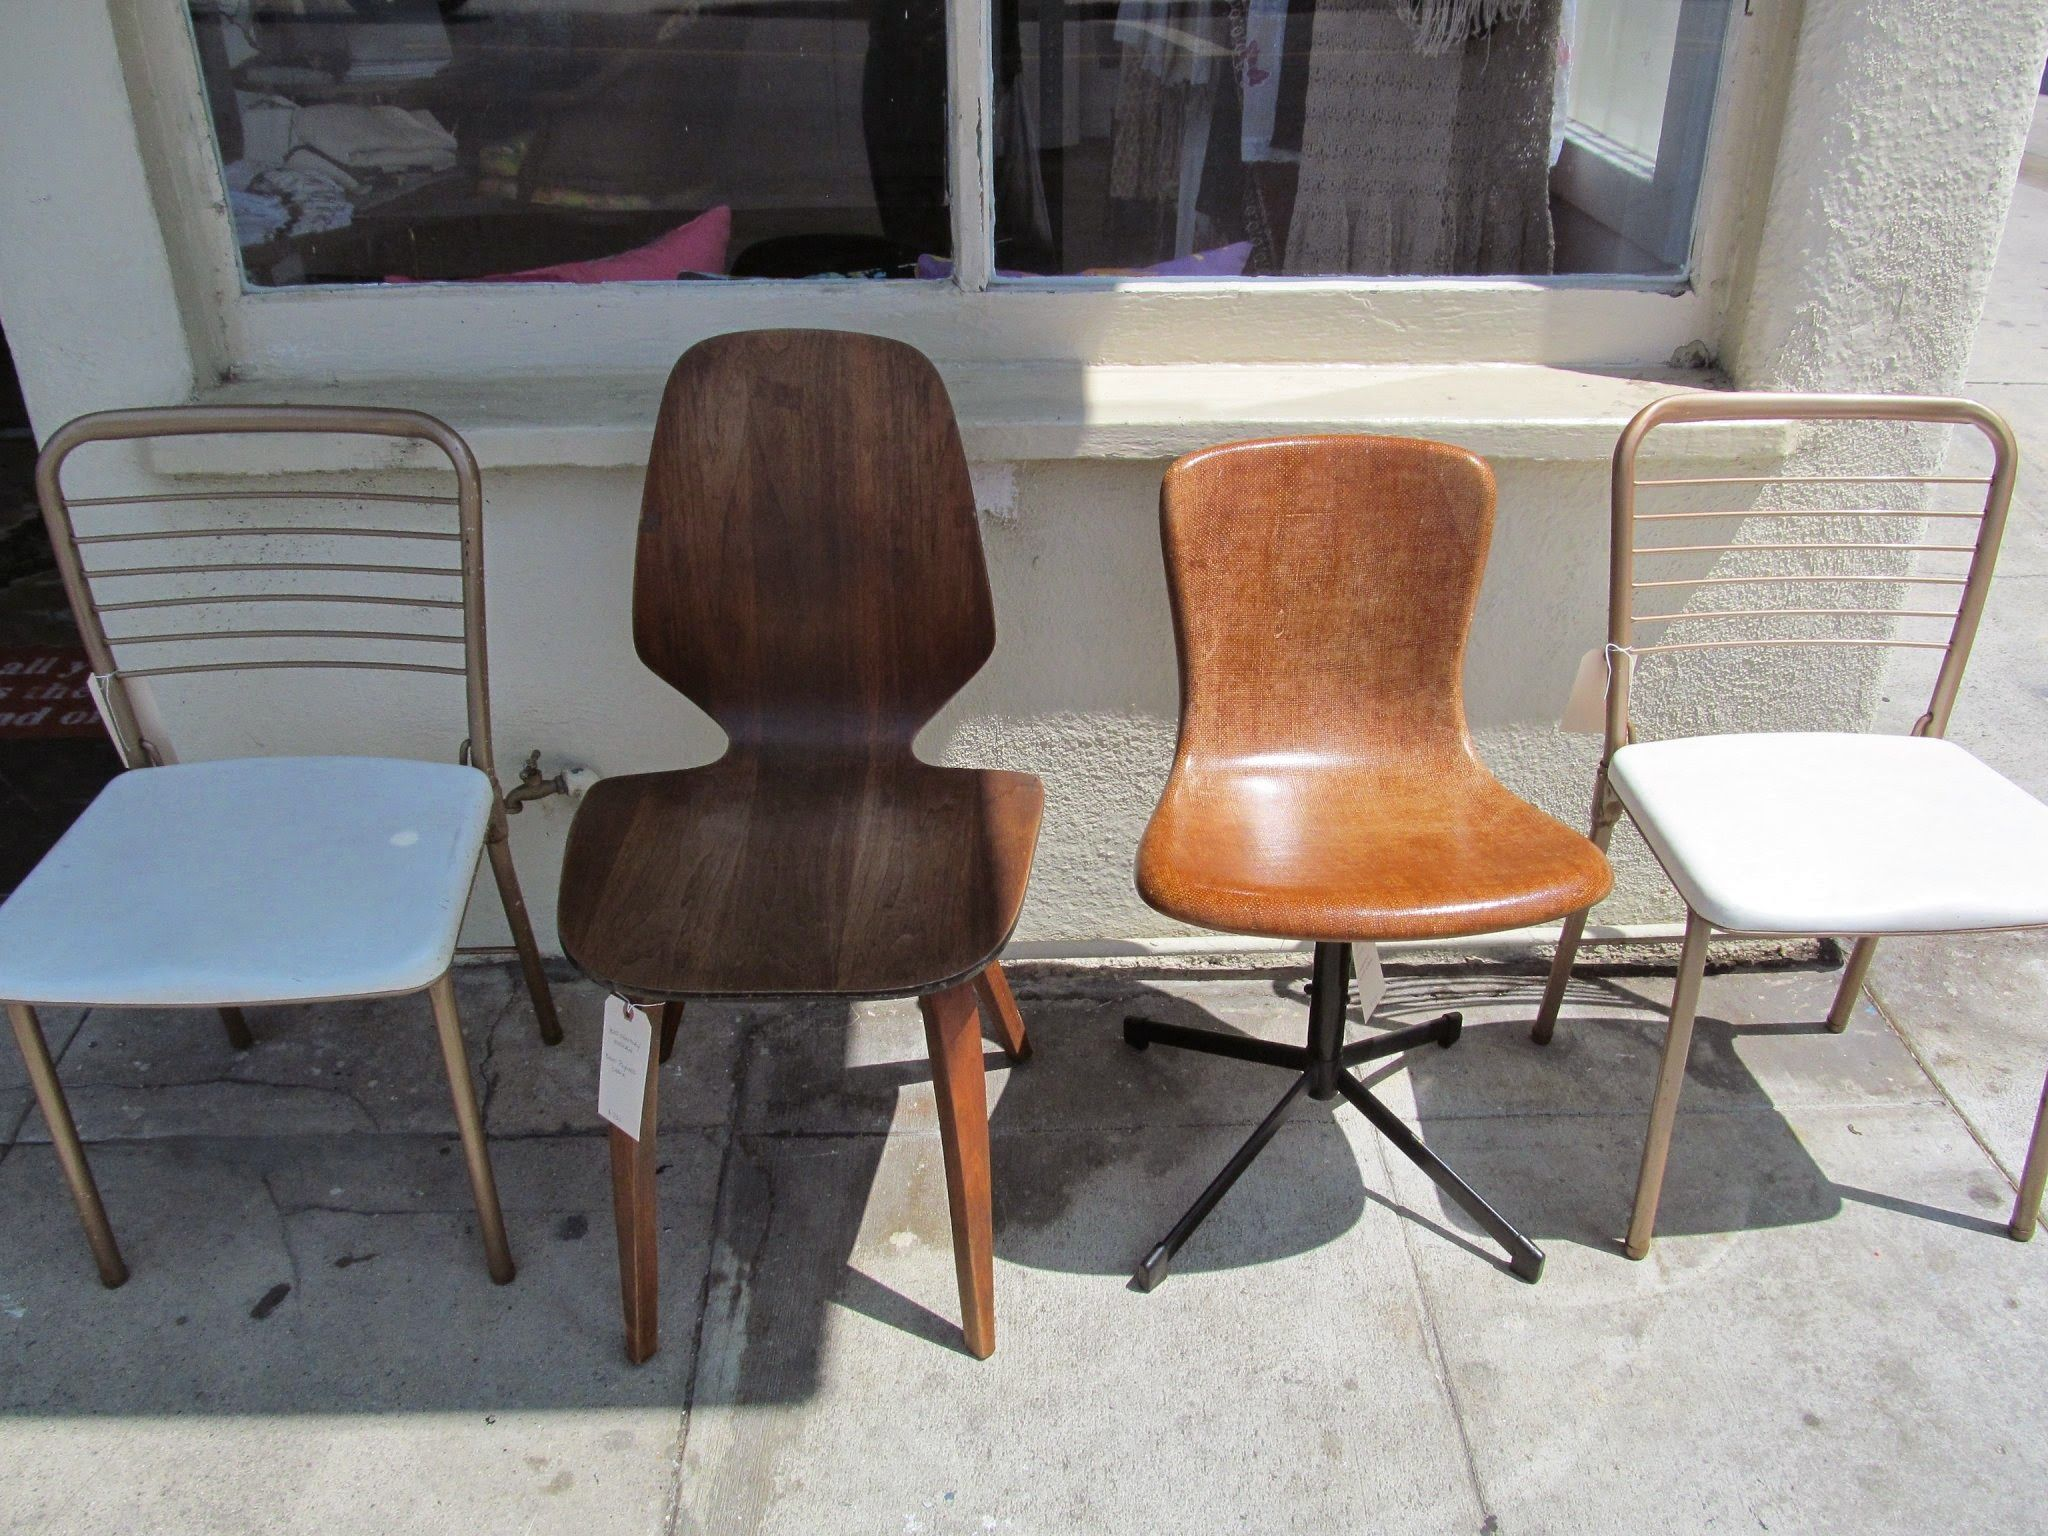 IHWT Vintage Mid Century Modern Chairs Hamilton Cosco folding